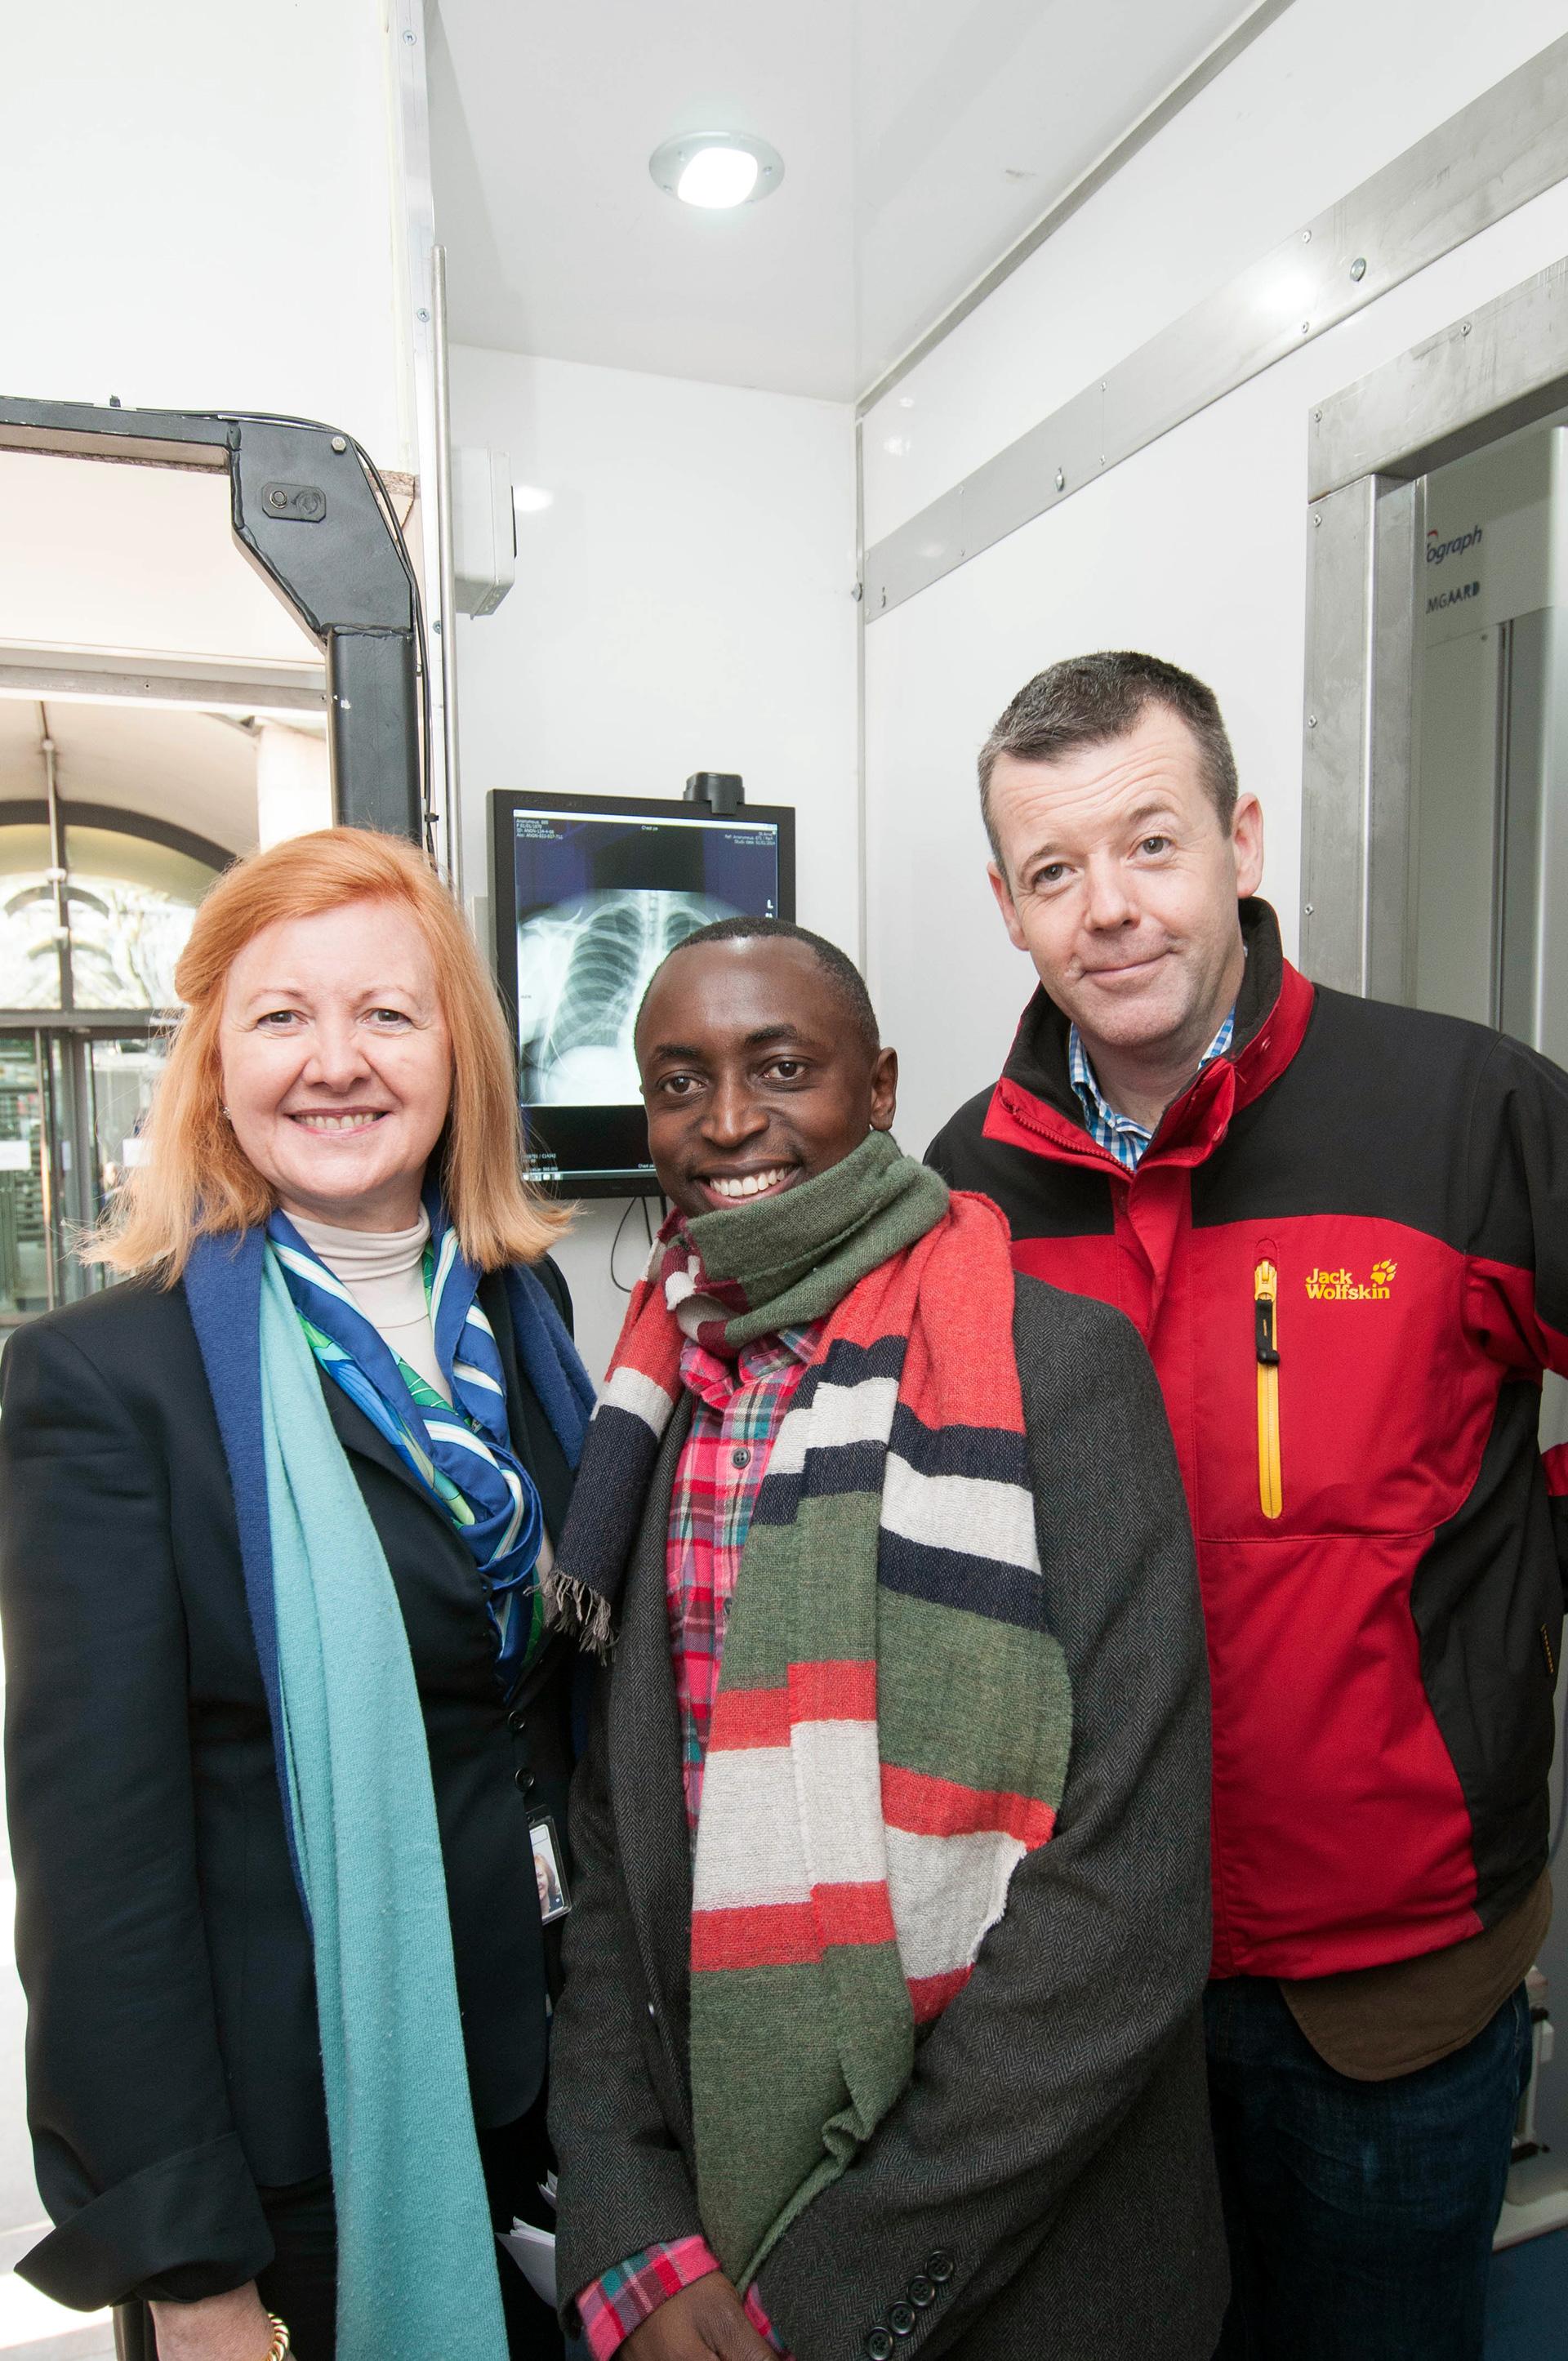 UCLH-TB-bus-initiative-launch-at-Portcullis-House-007_Adam-Scott